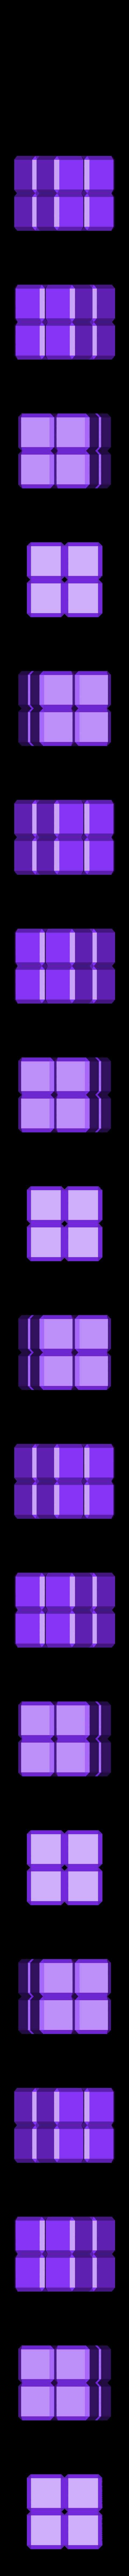 2x2x2.stl Download free STL file Cube Puzzle: 5 x 5 x 5, Five-Piece Dissection • 3D print model, LGBU